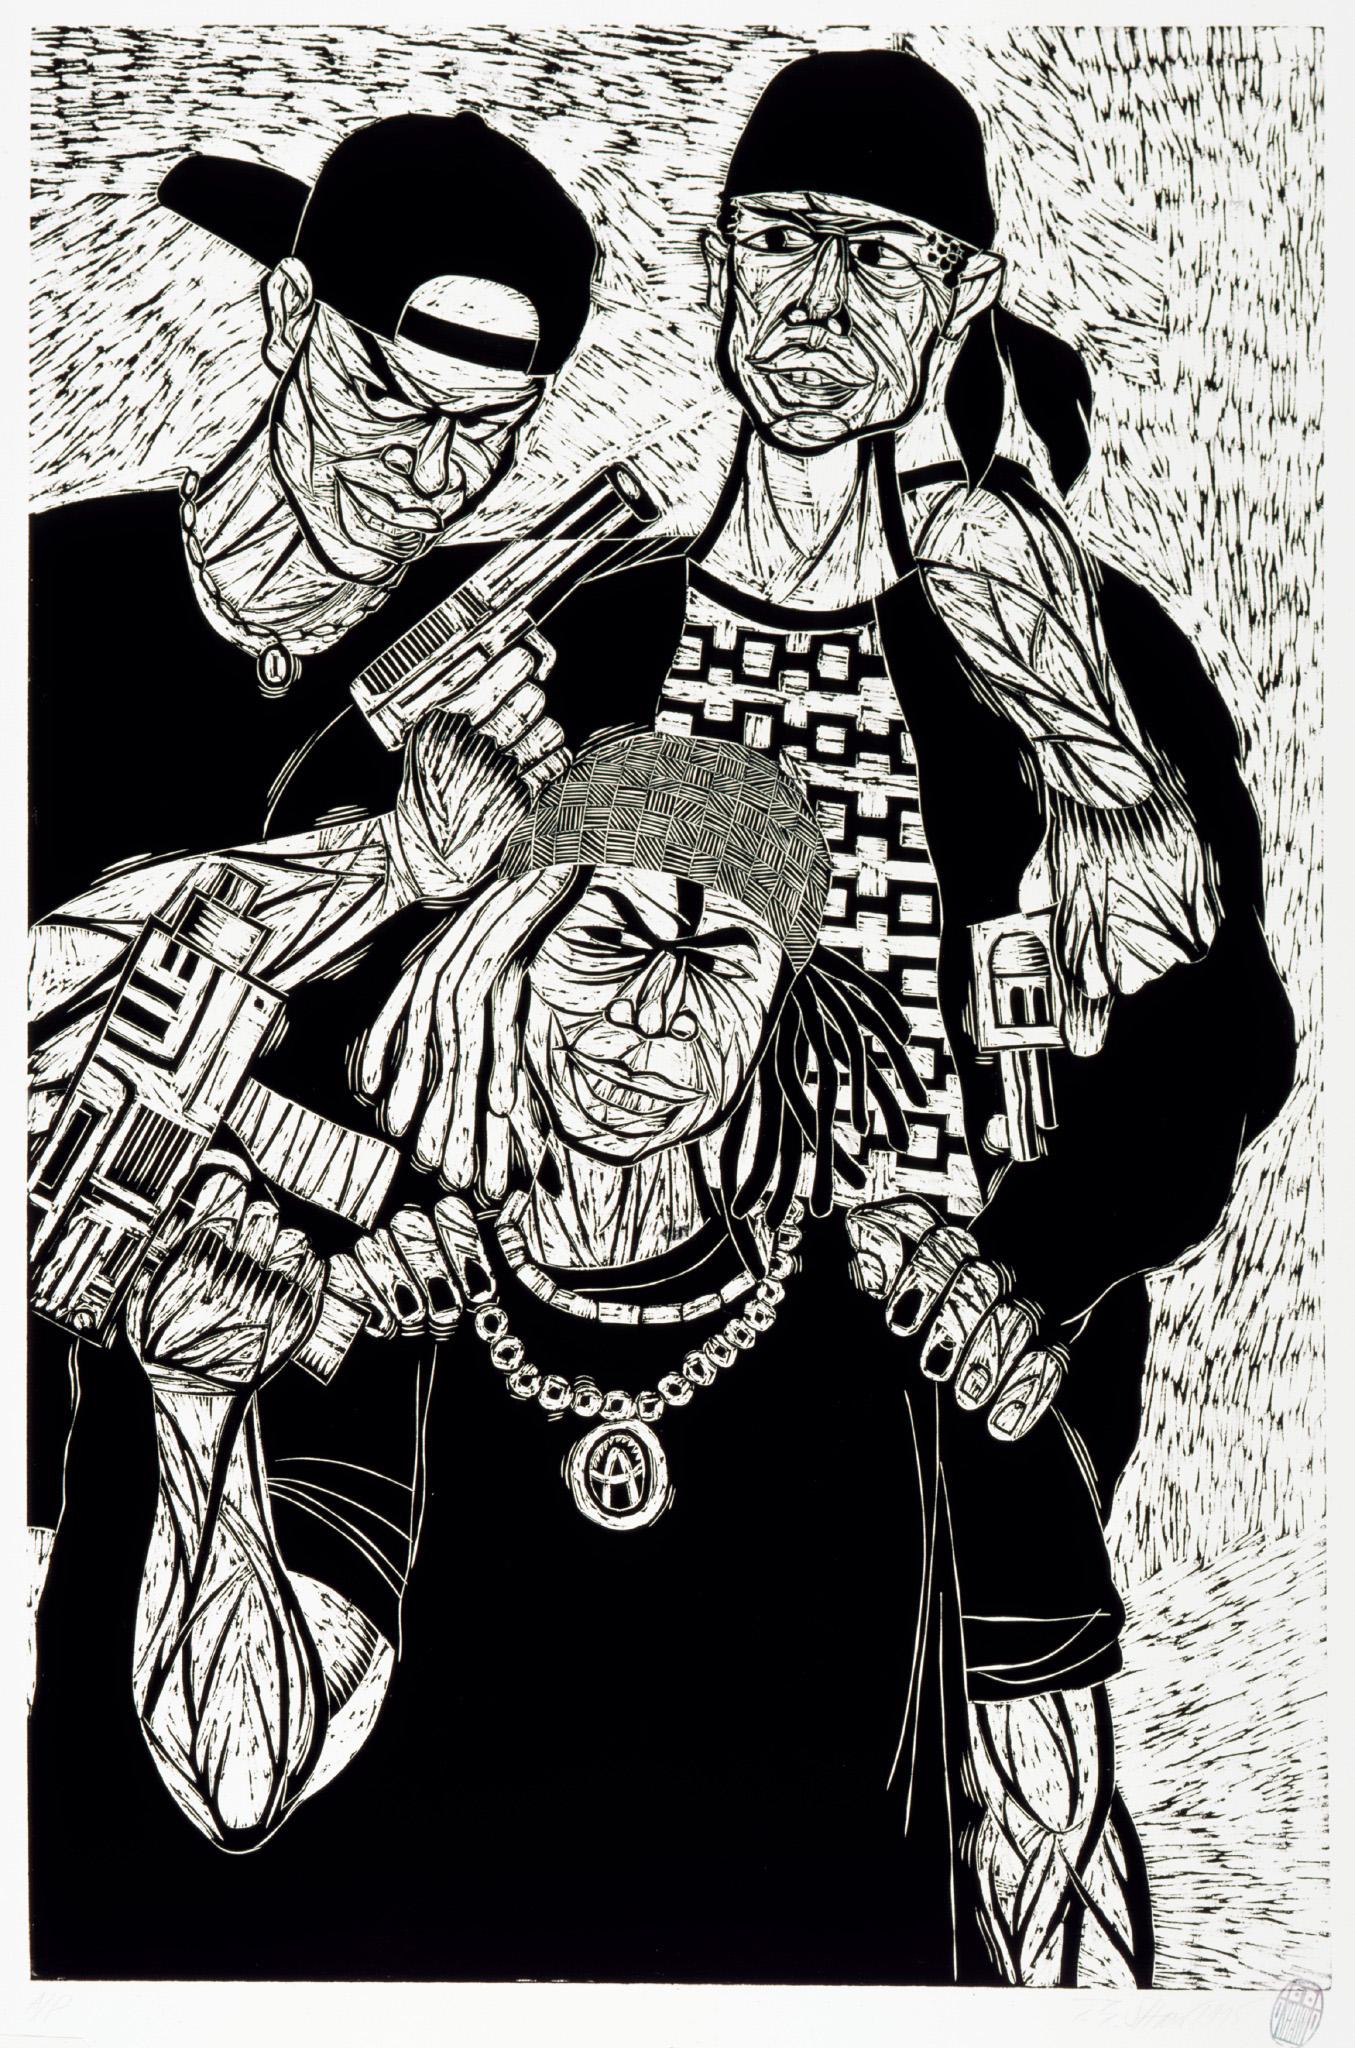 1. Family, woodcut print, 1995, 48x32